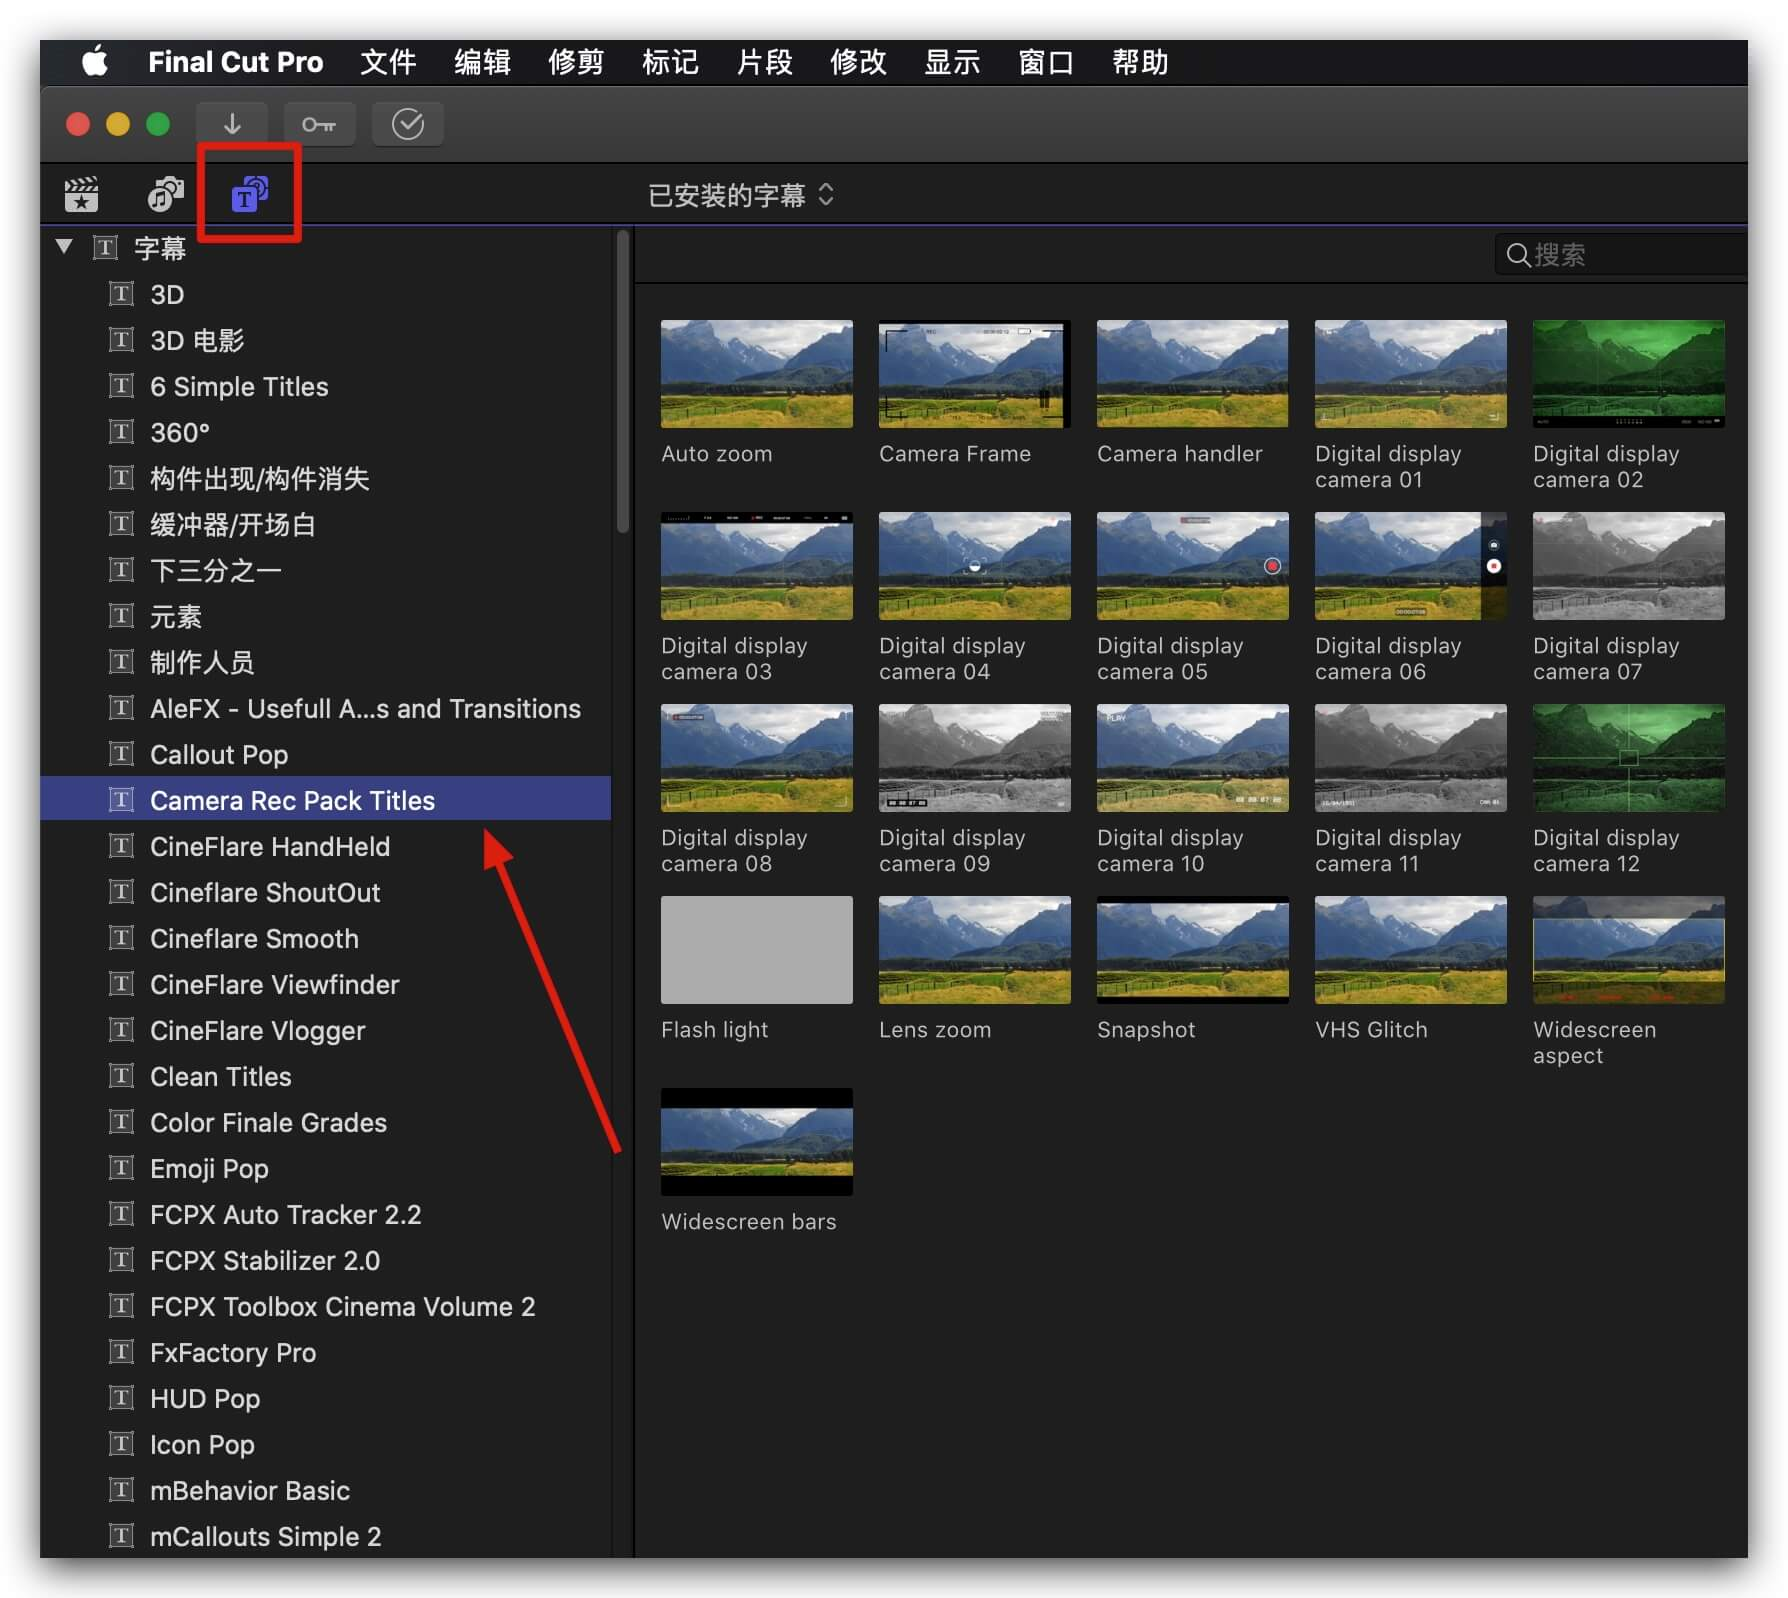 fcpx插件 影片添加相机快门数码屏显对焦VHS闪白等效果 Camera Display